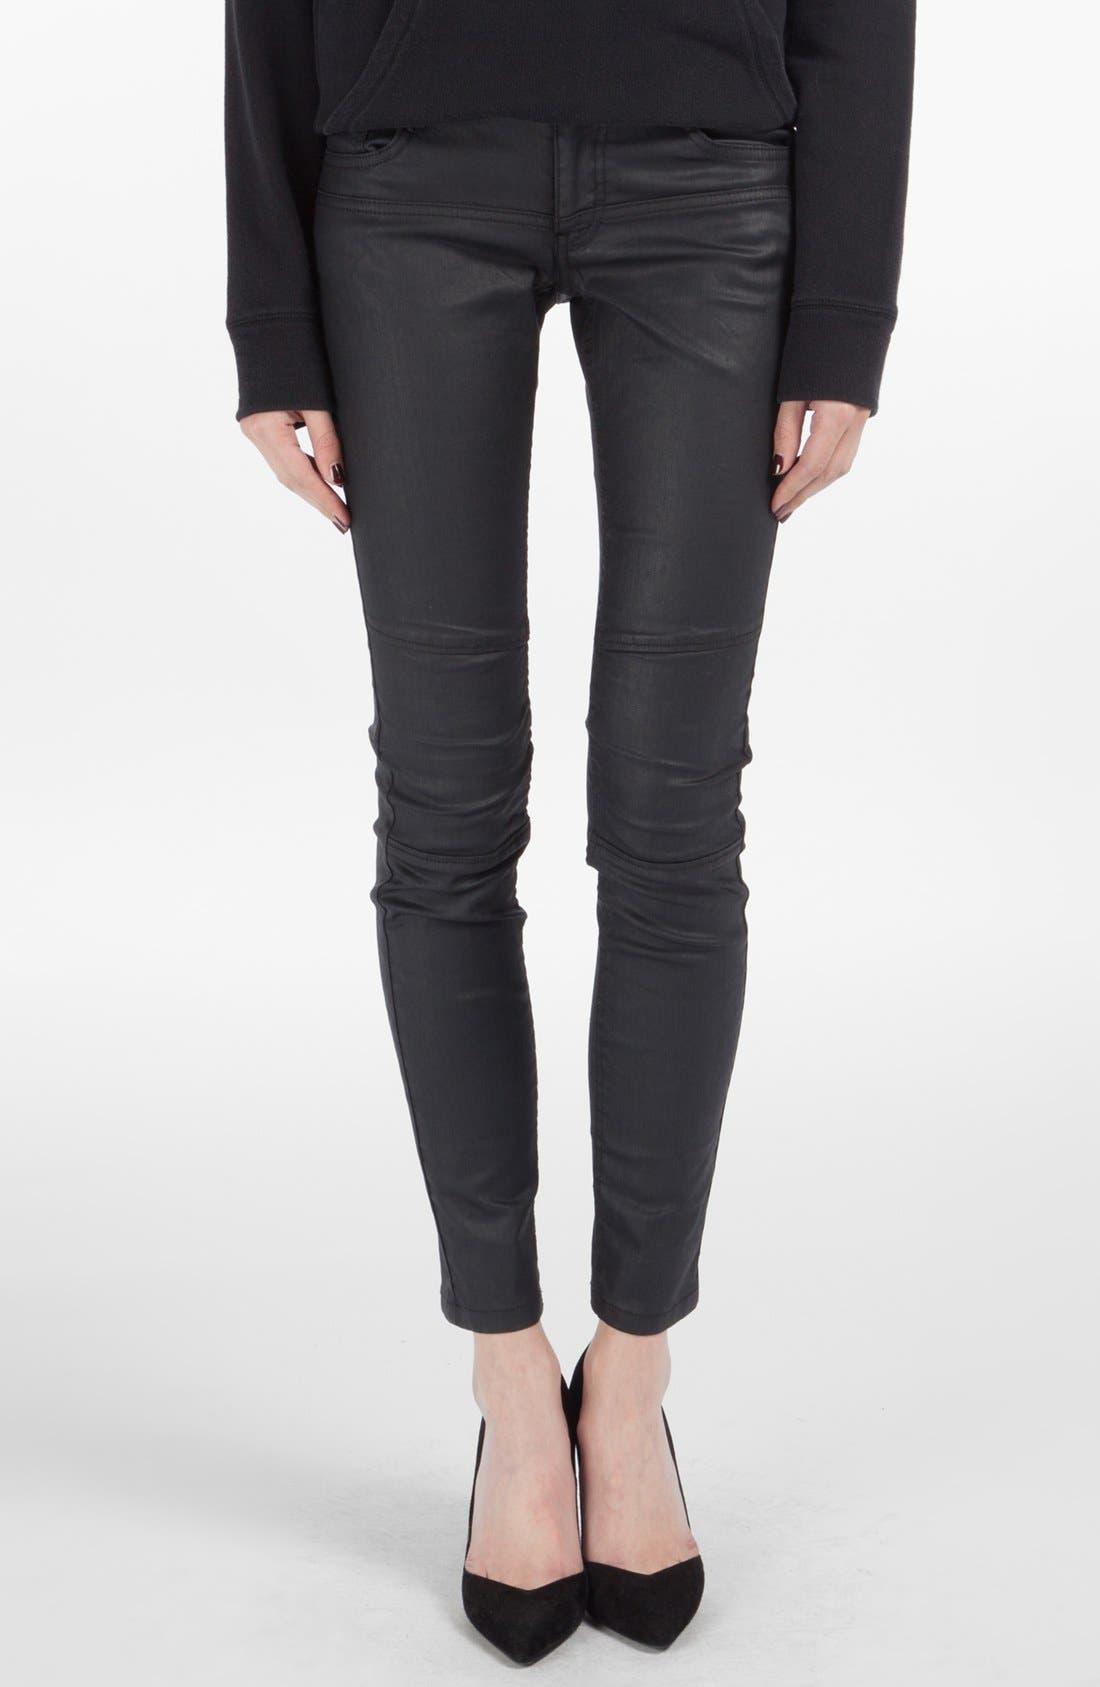 Alternate Image 1 Selected - maje 'Samir' Coated Skinny Jeans (Marine)